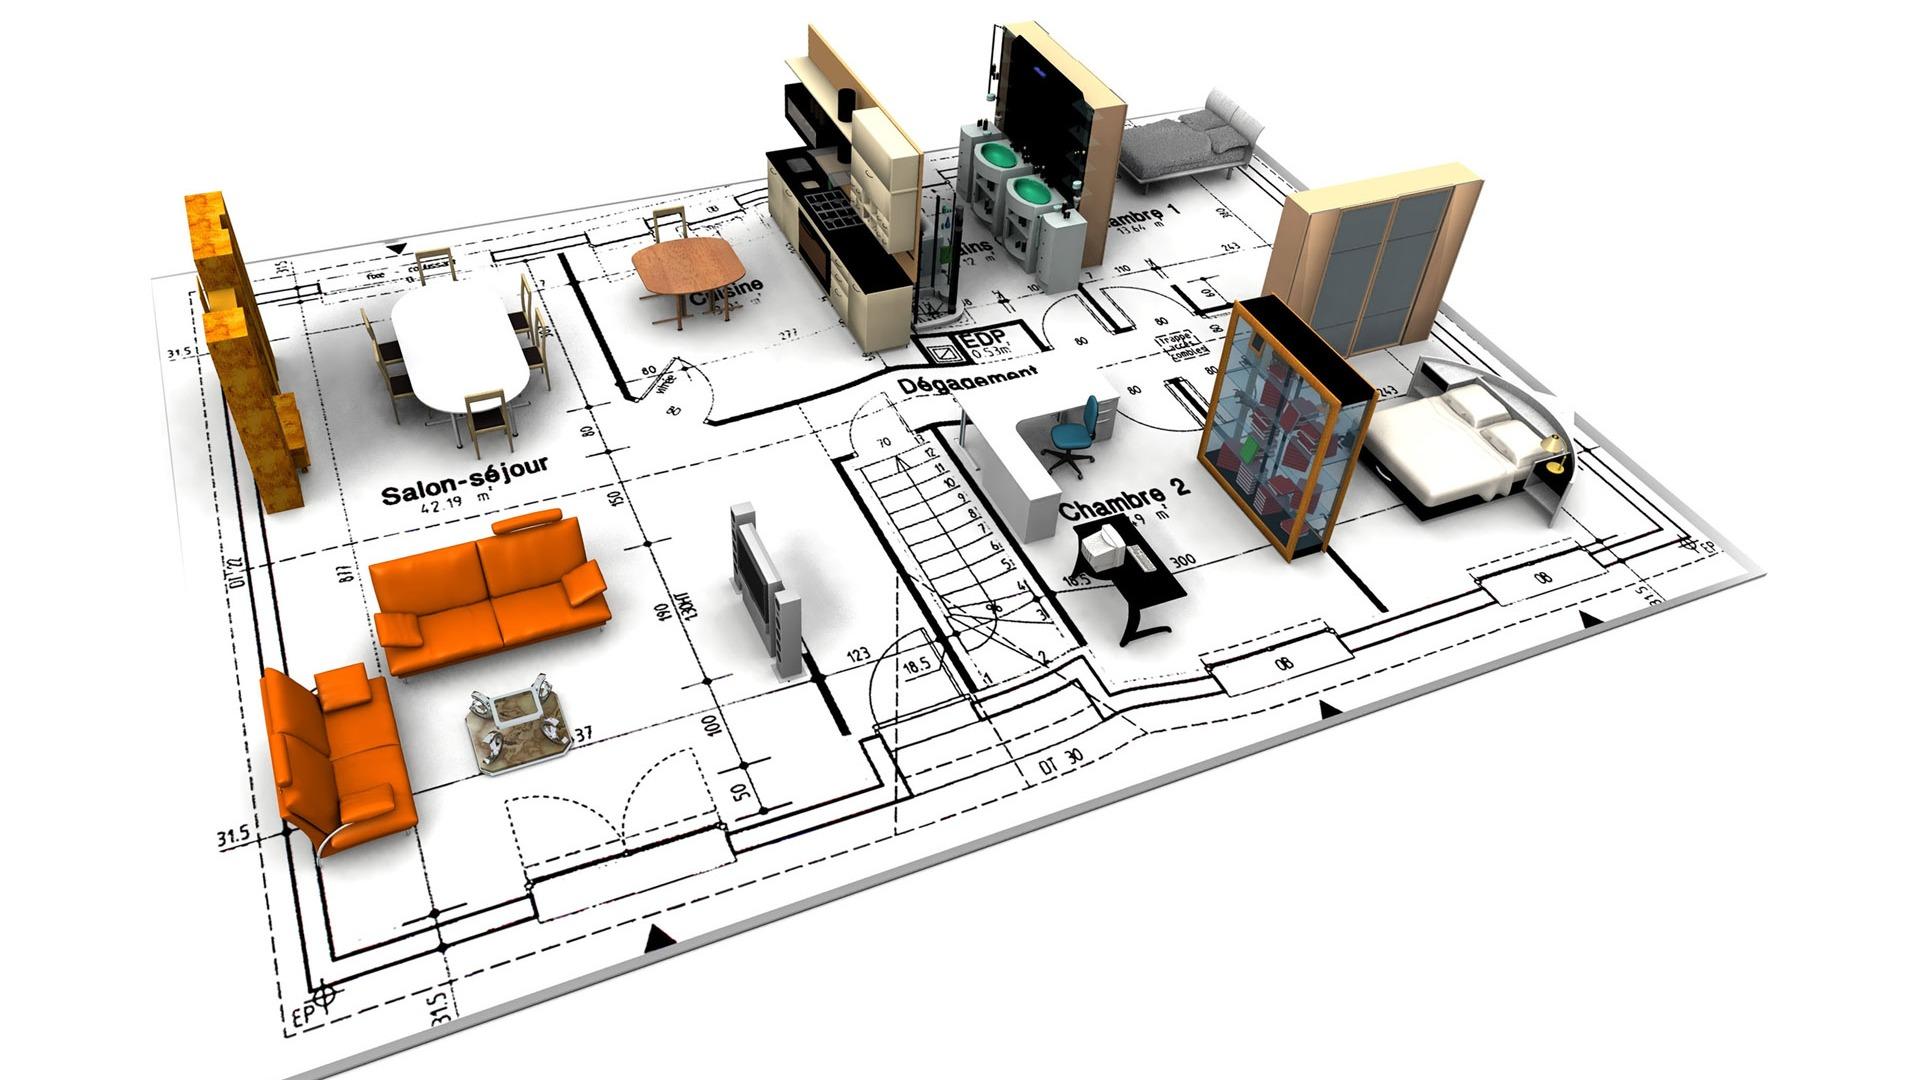 3d architectural design wallpaper 2 3 1920x1080 for Architecture and design